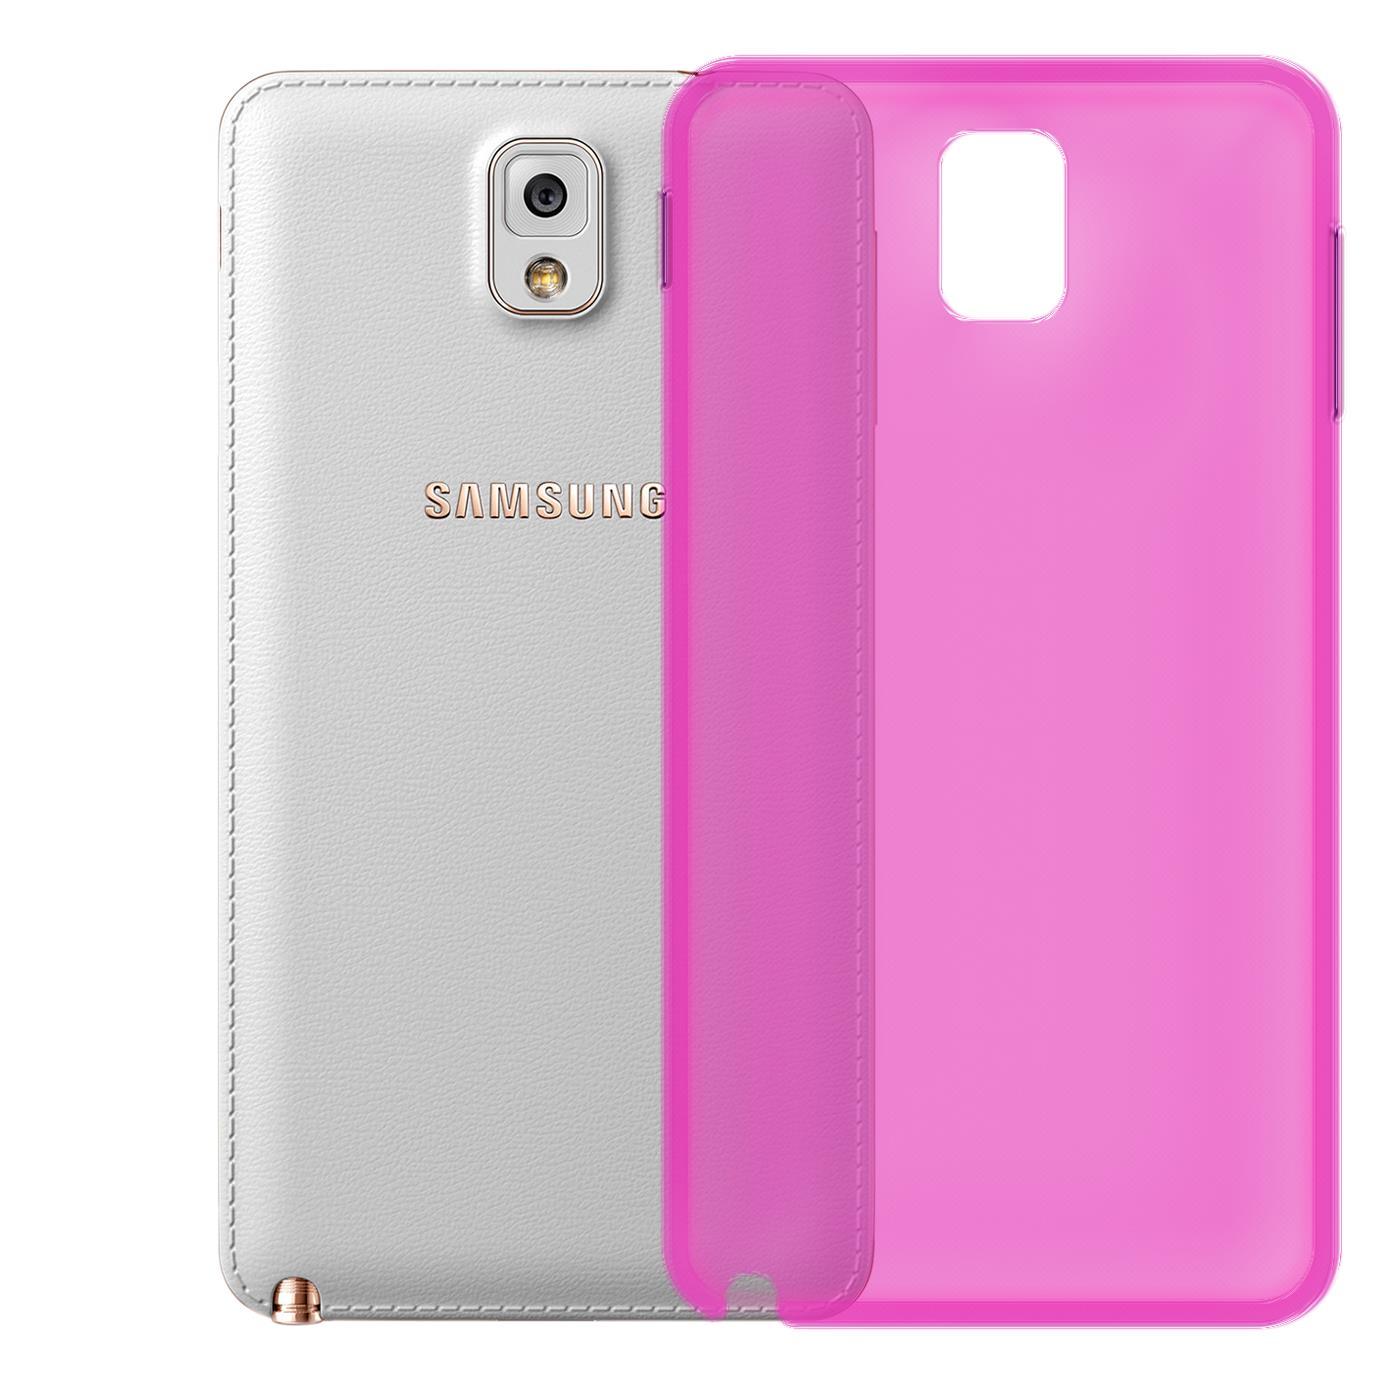 Samsung-Galaxy-Note-4-Thin-Silikon-Klar-Case-Cover-Ultra-Slim-Stossfeste-Gel Indexbild 24